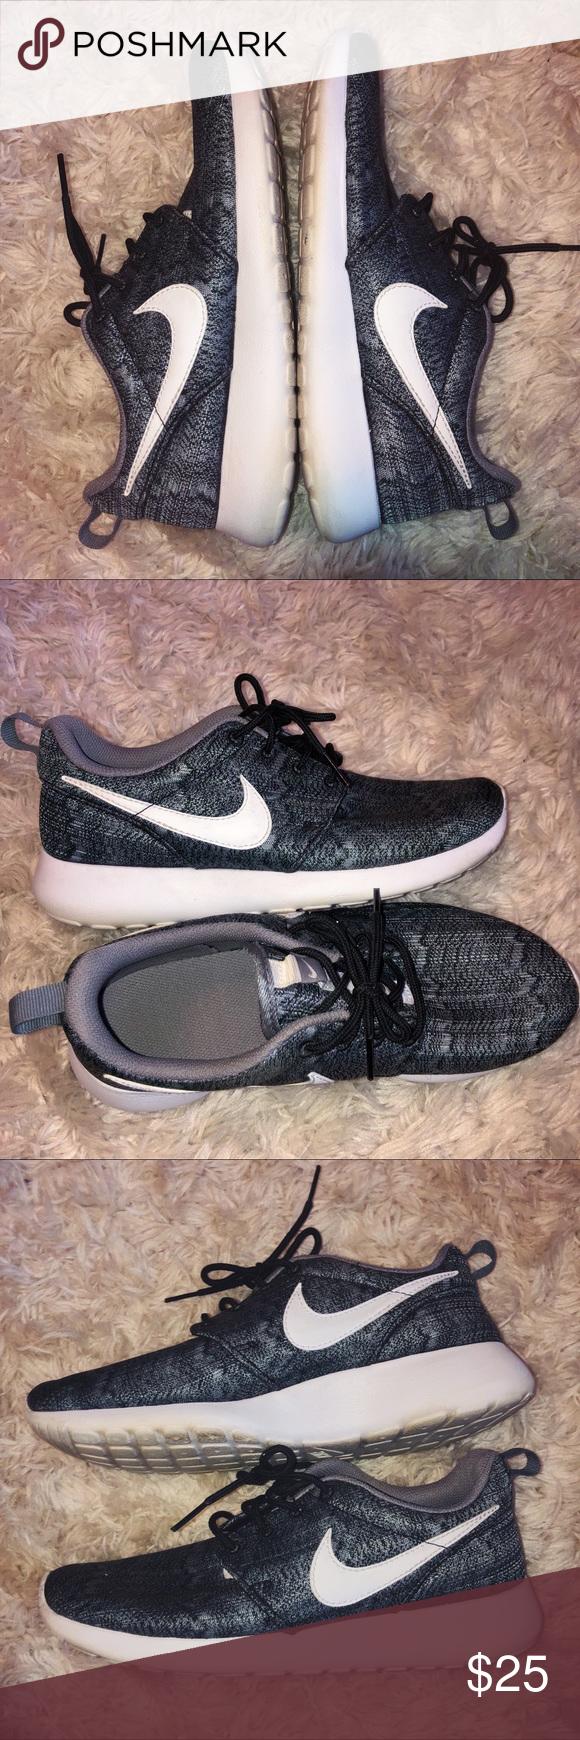 new concept 1e9ec d1cb5 Nike Roshe Sneakers Gray and black nike Roshes White sole ...